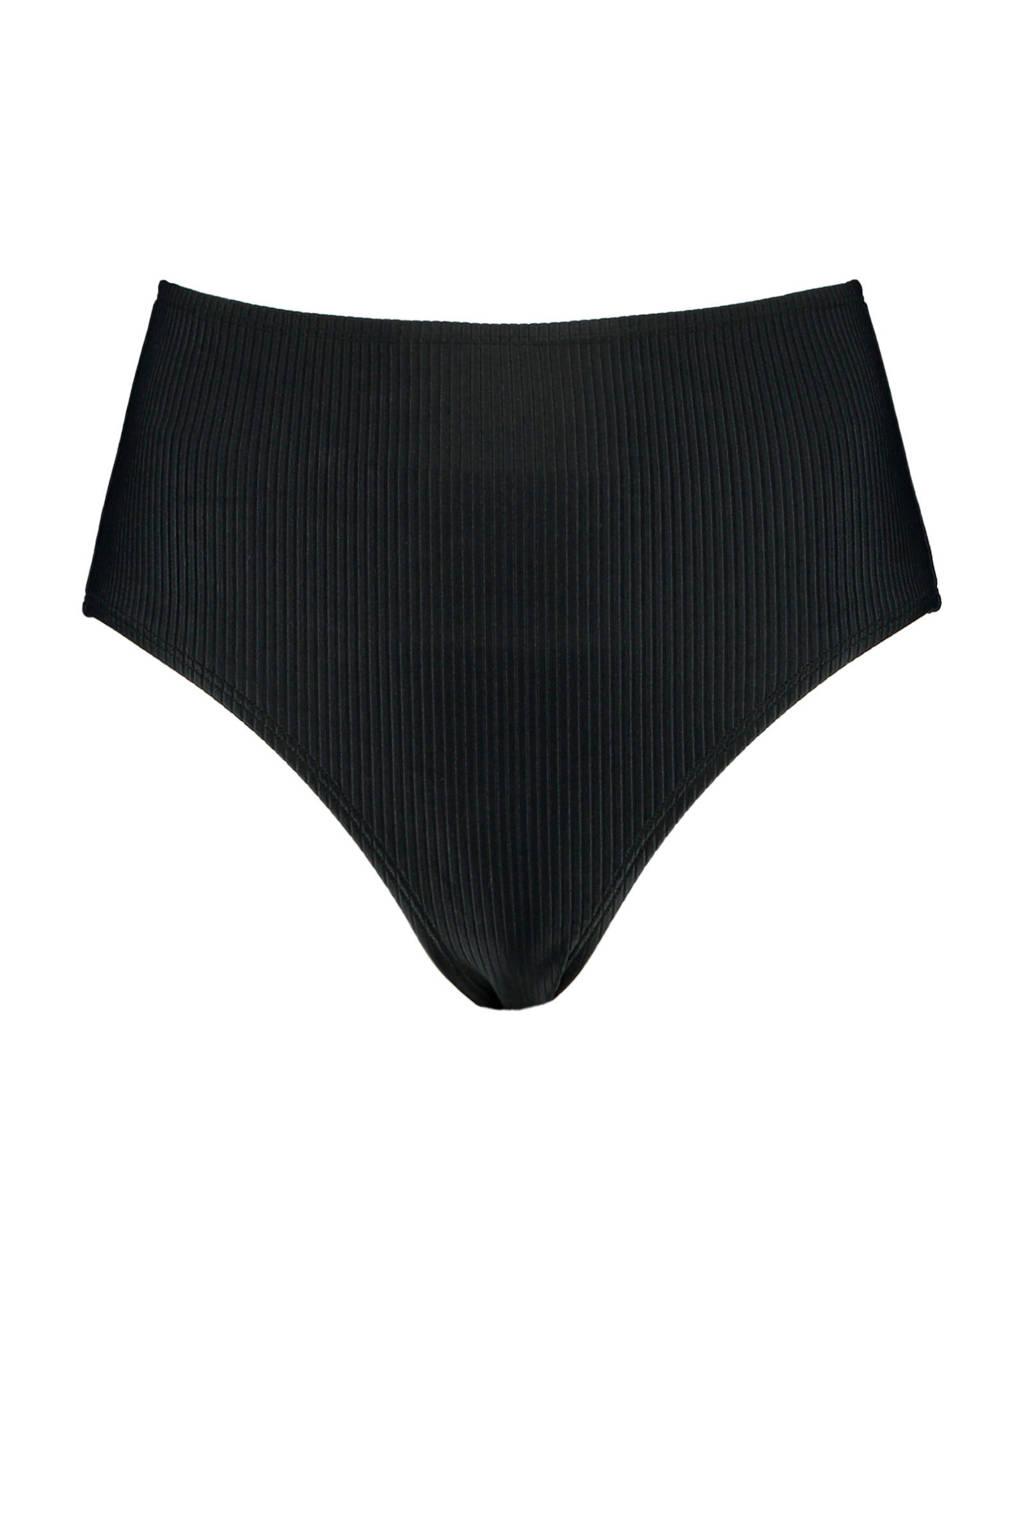 America Today high waist brazilian bikinibroekje Apua met rib structuur zwart, Zwart